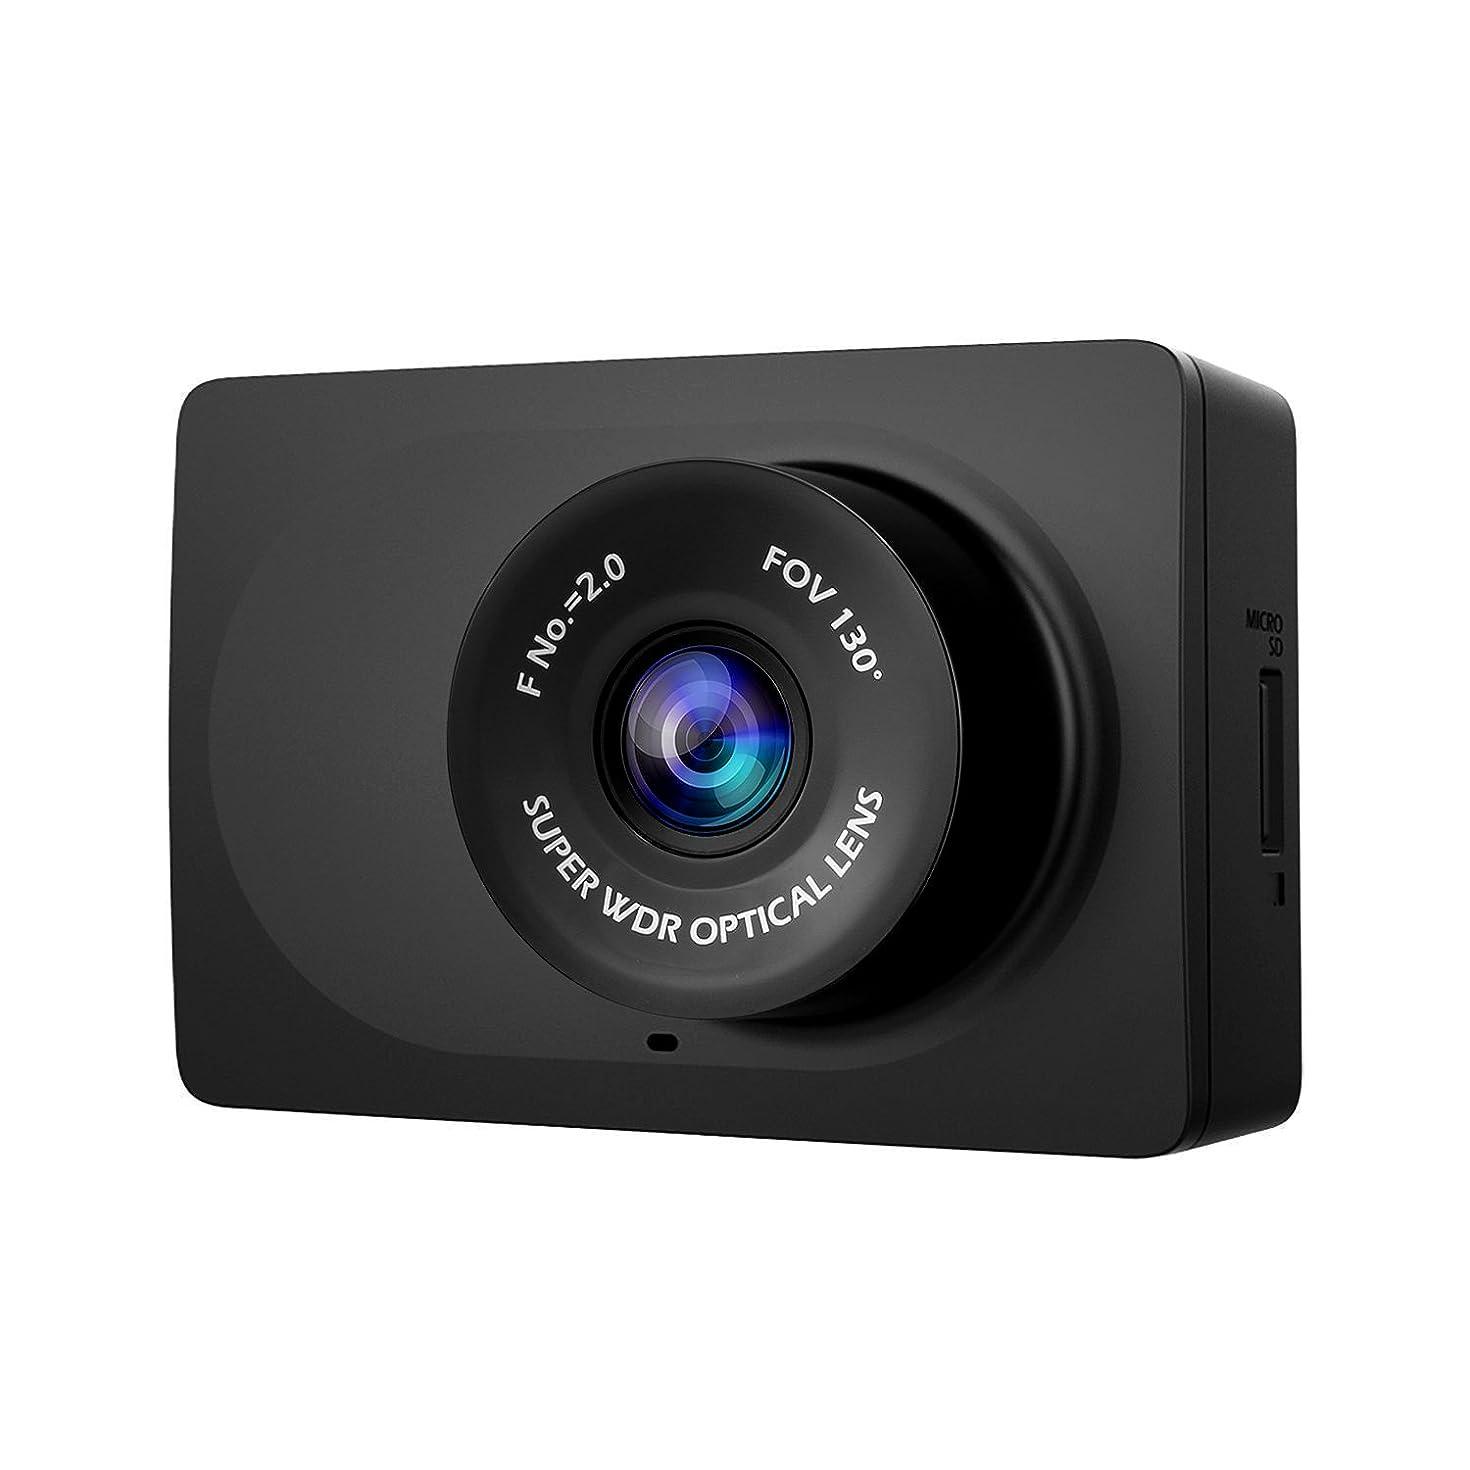 "YI Compact Dash Cam, 1080p Full HD Car Dashboard Camera with 2.7"" LCD Screen, 130° WDR Lens, Mobile APP, G-Sensor, Night Vision, Loop Recording - Black"